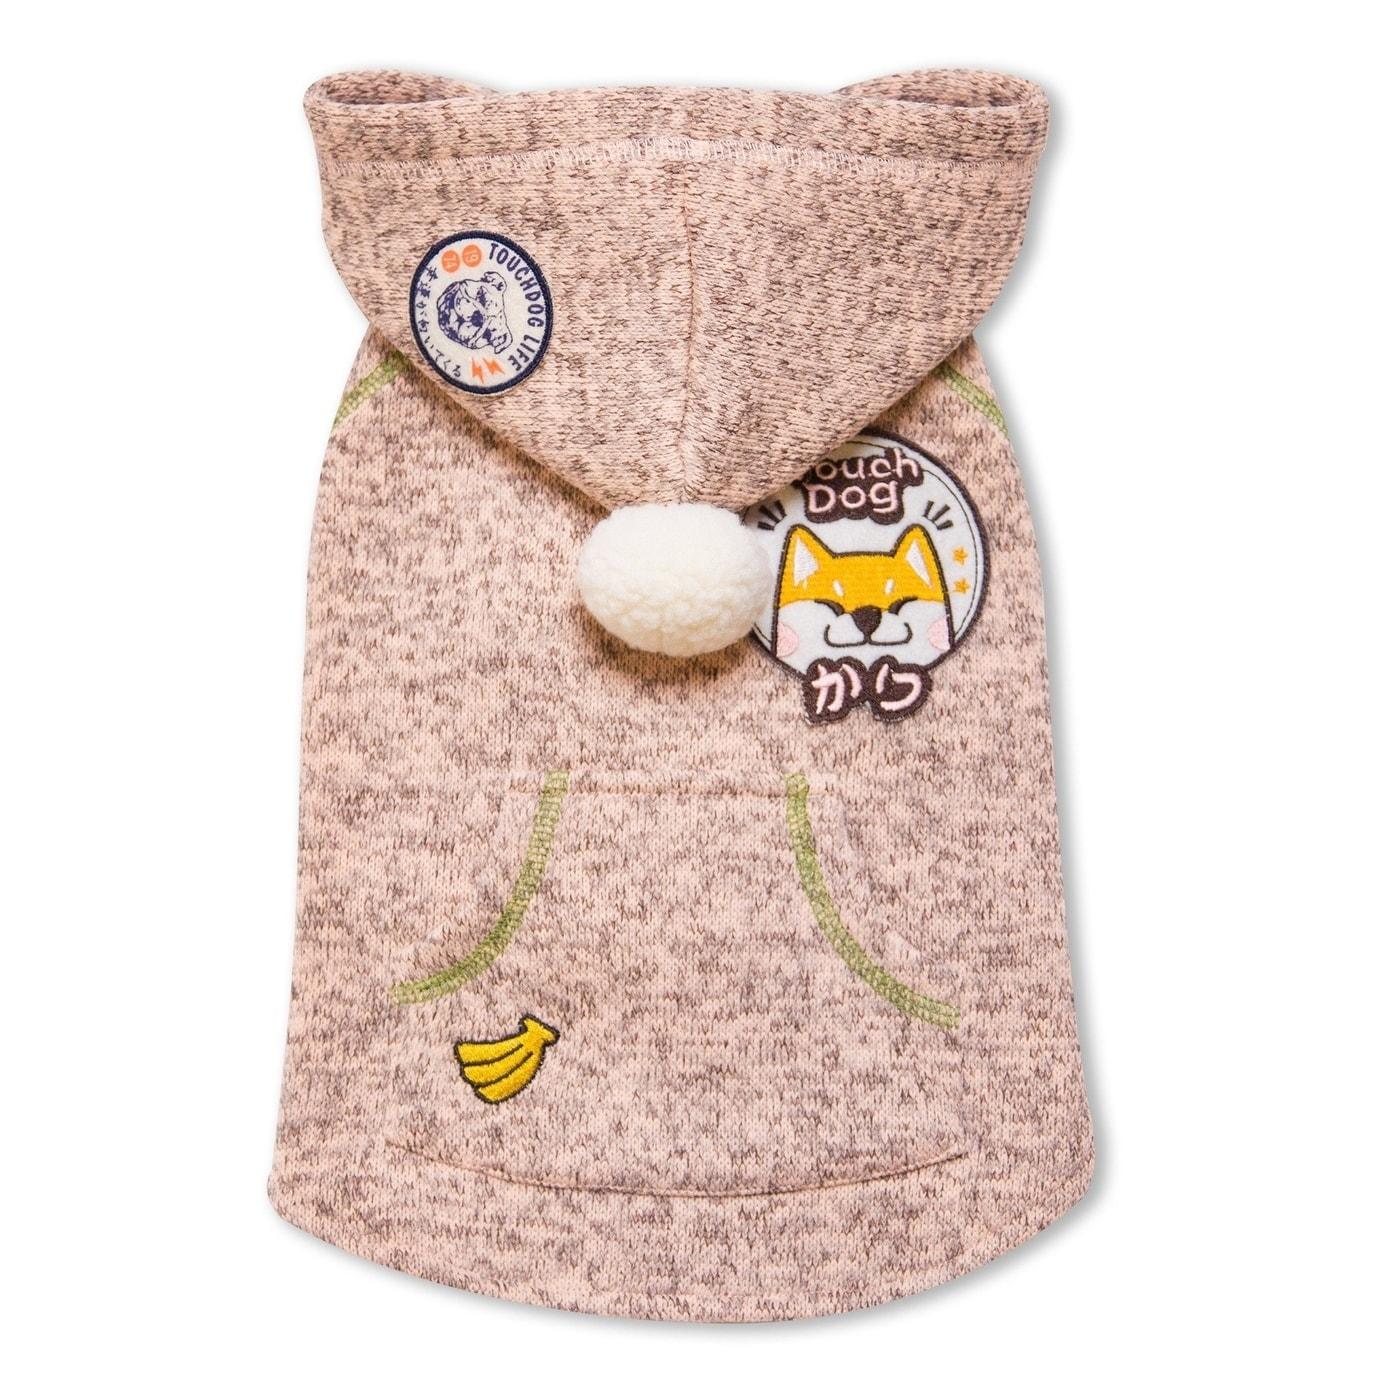 Touchdog Hippie Embellished Designer Sleeveless Pompom Pe...